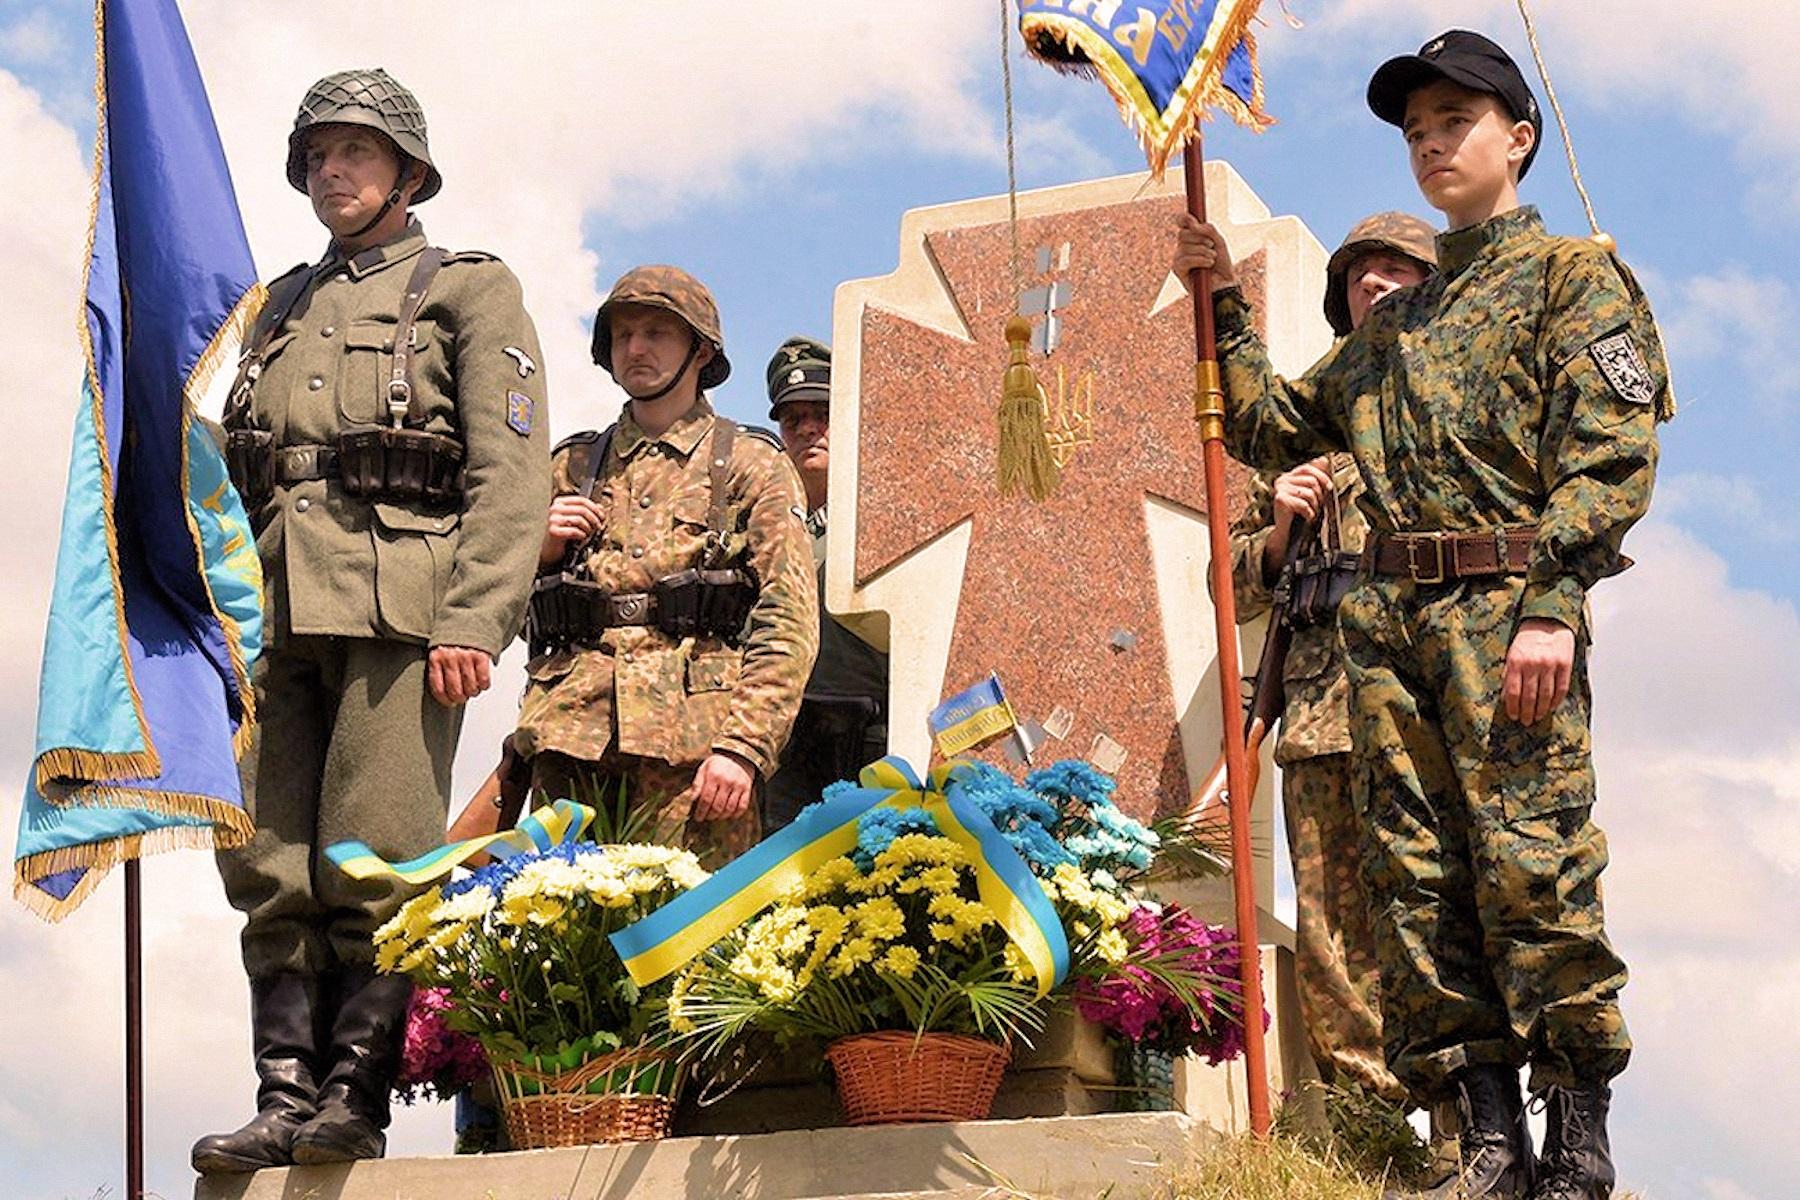 00 ukraine ss funeral lvov 01 070816